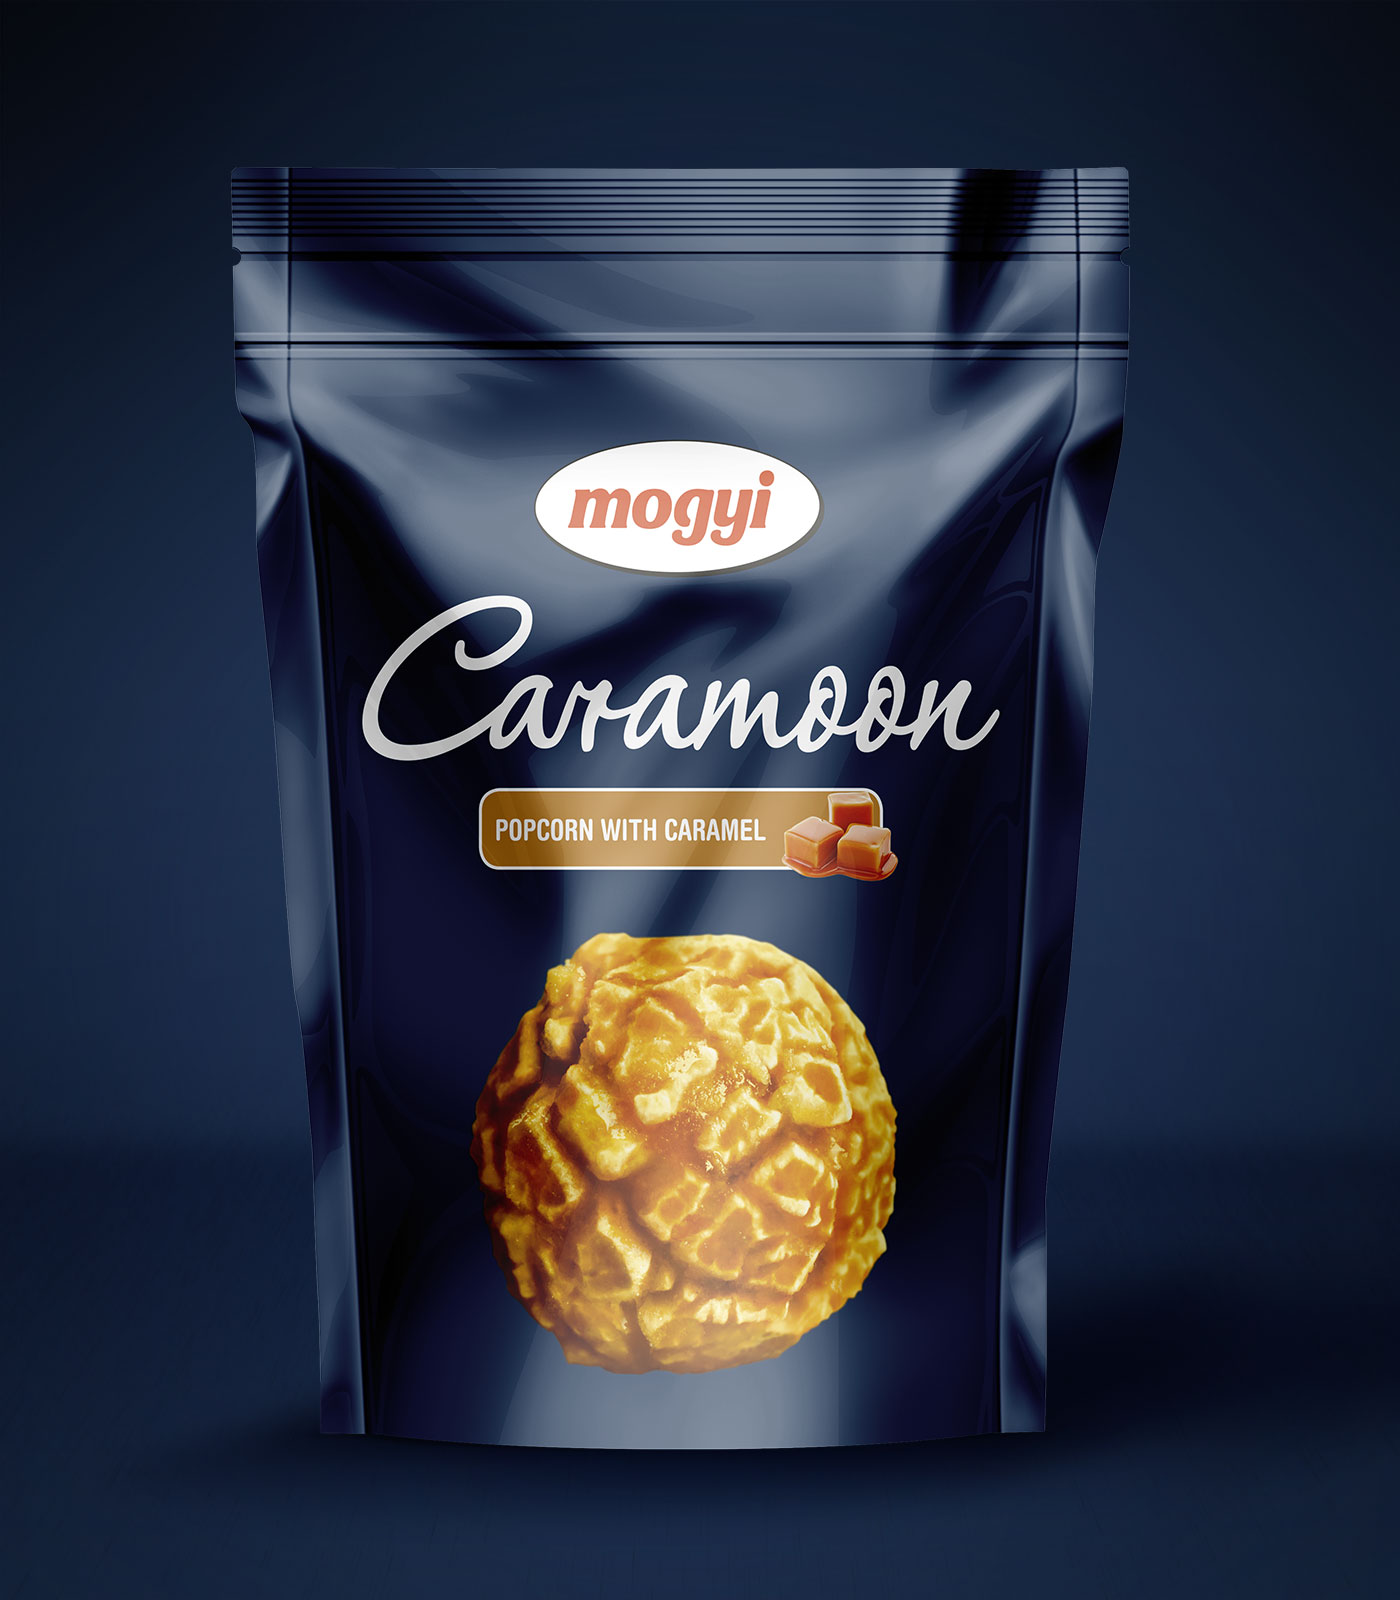 Mogyi Carammon - Popcorn with Caramell